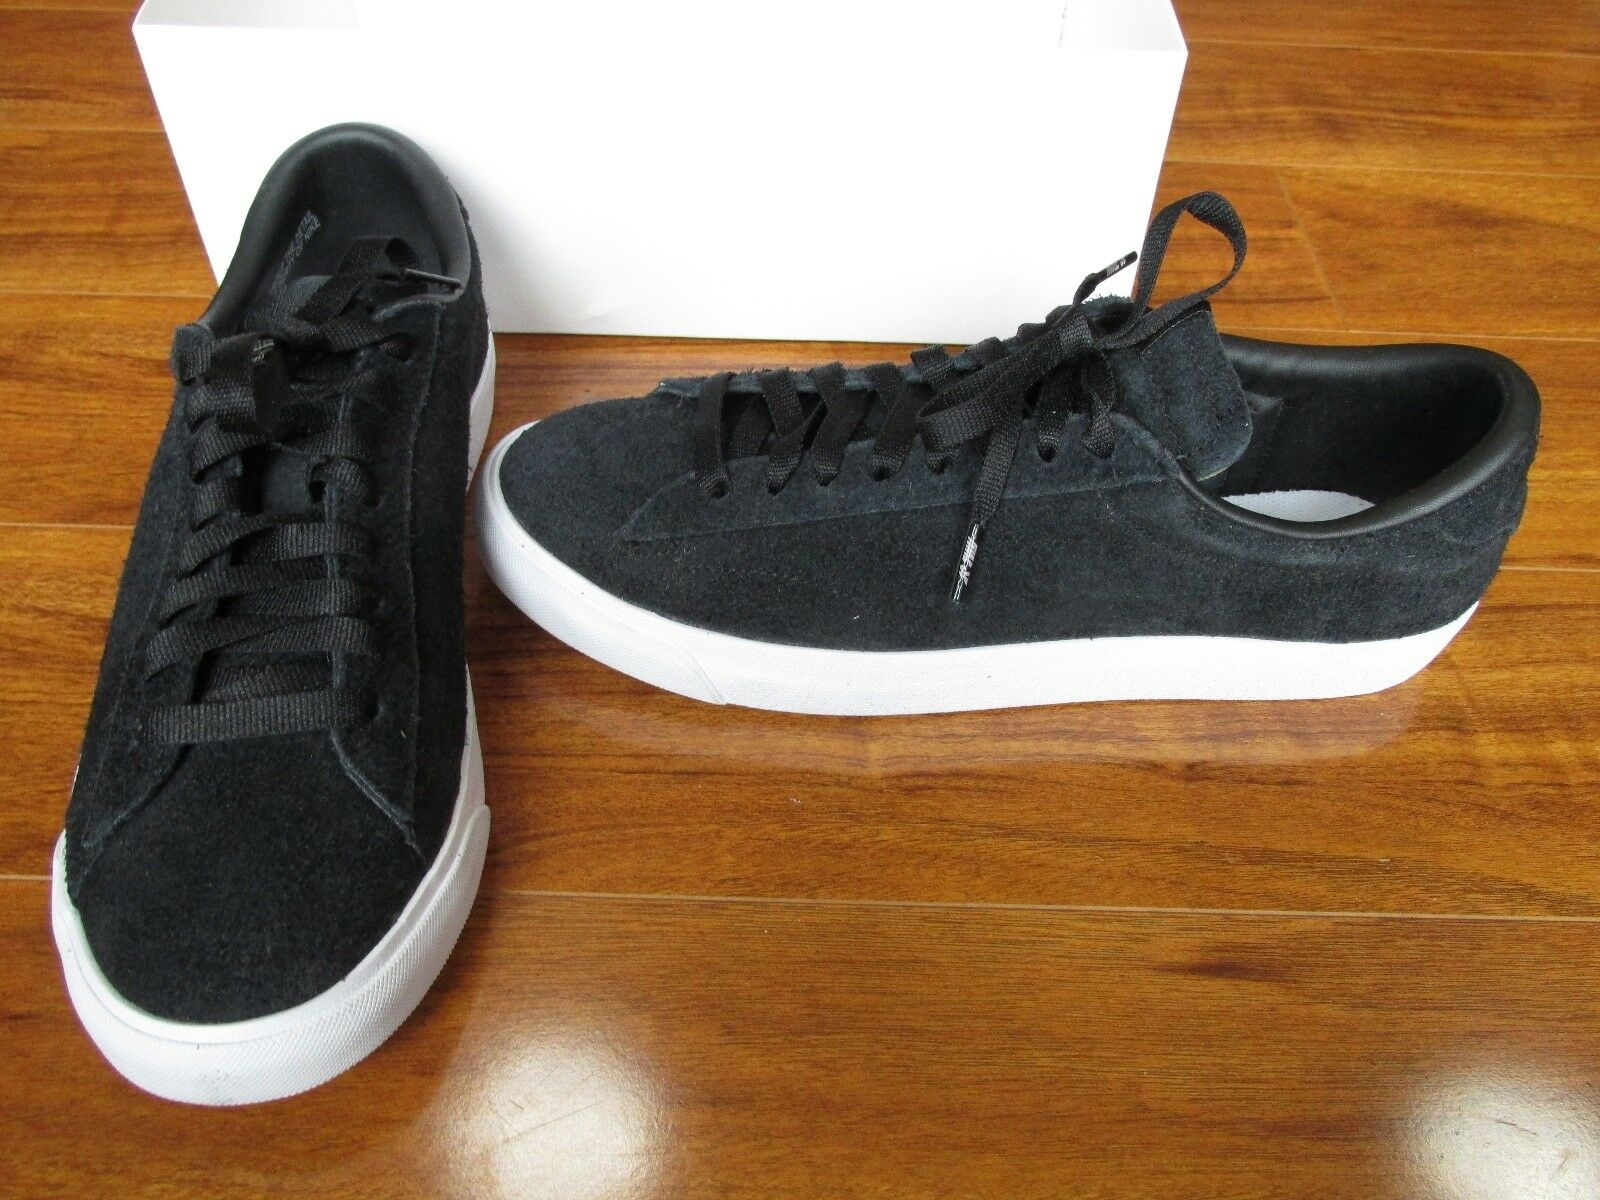 Nuove Nike Tennis Classic 693505 (Sp Frammento Uomo 10,5 Nero 693505 Classic 001 150 bcfc28